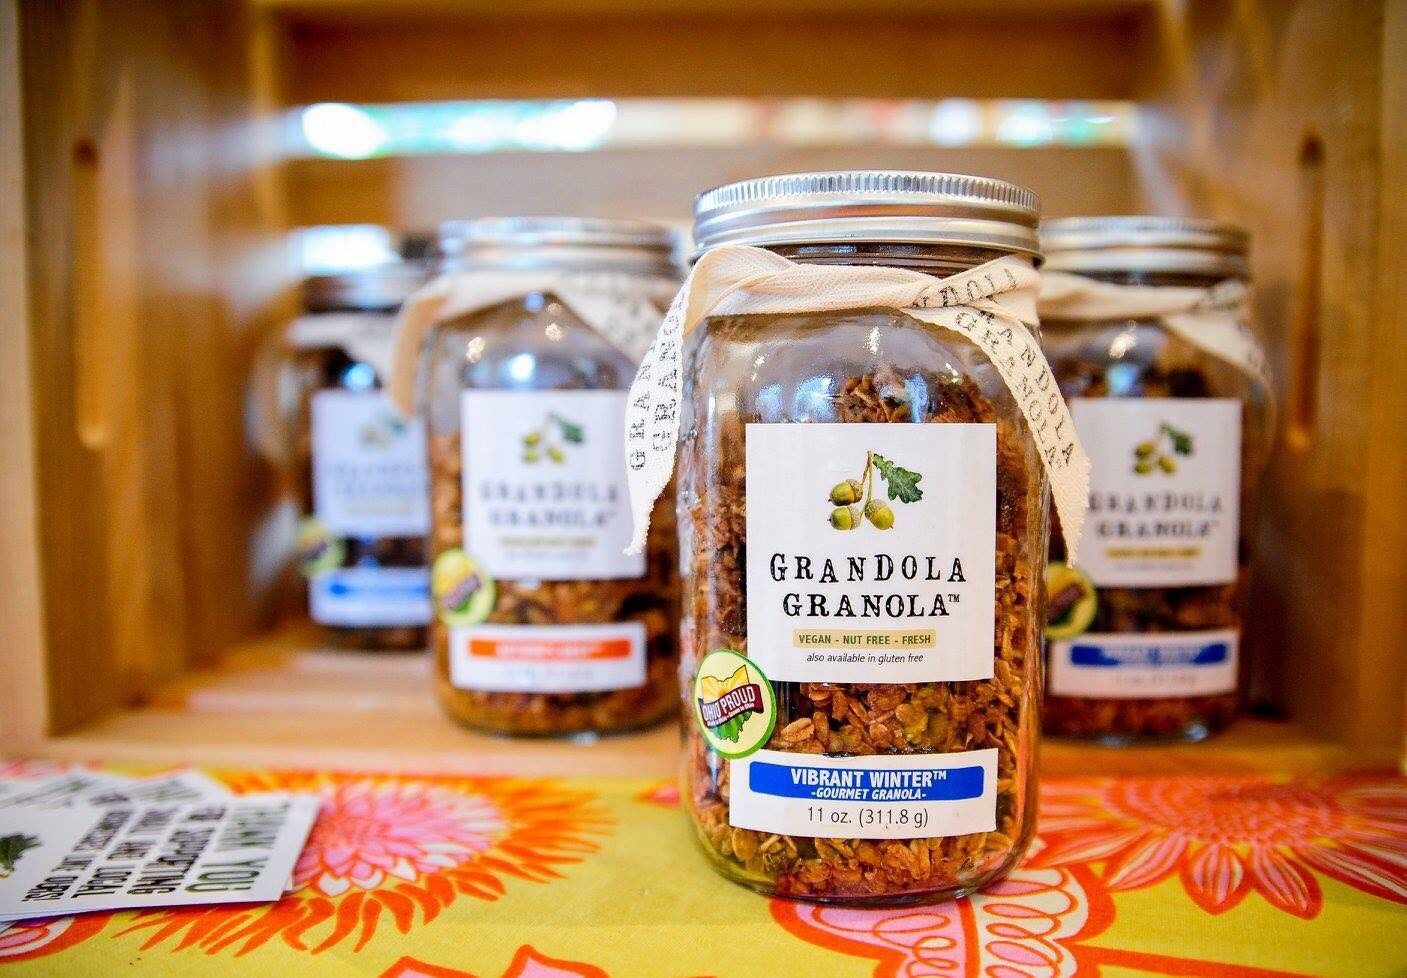 Grandola Granola WestSide market Cincinnati